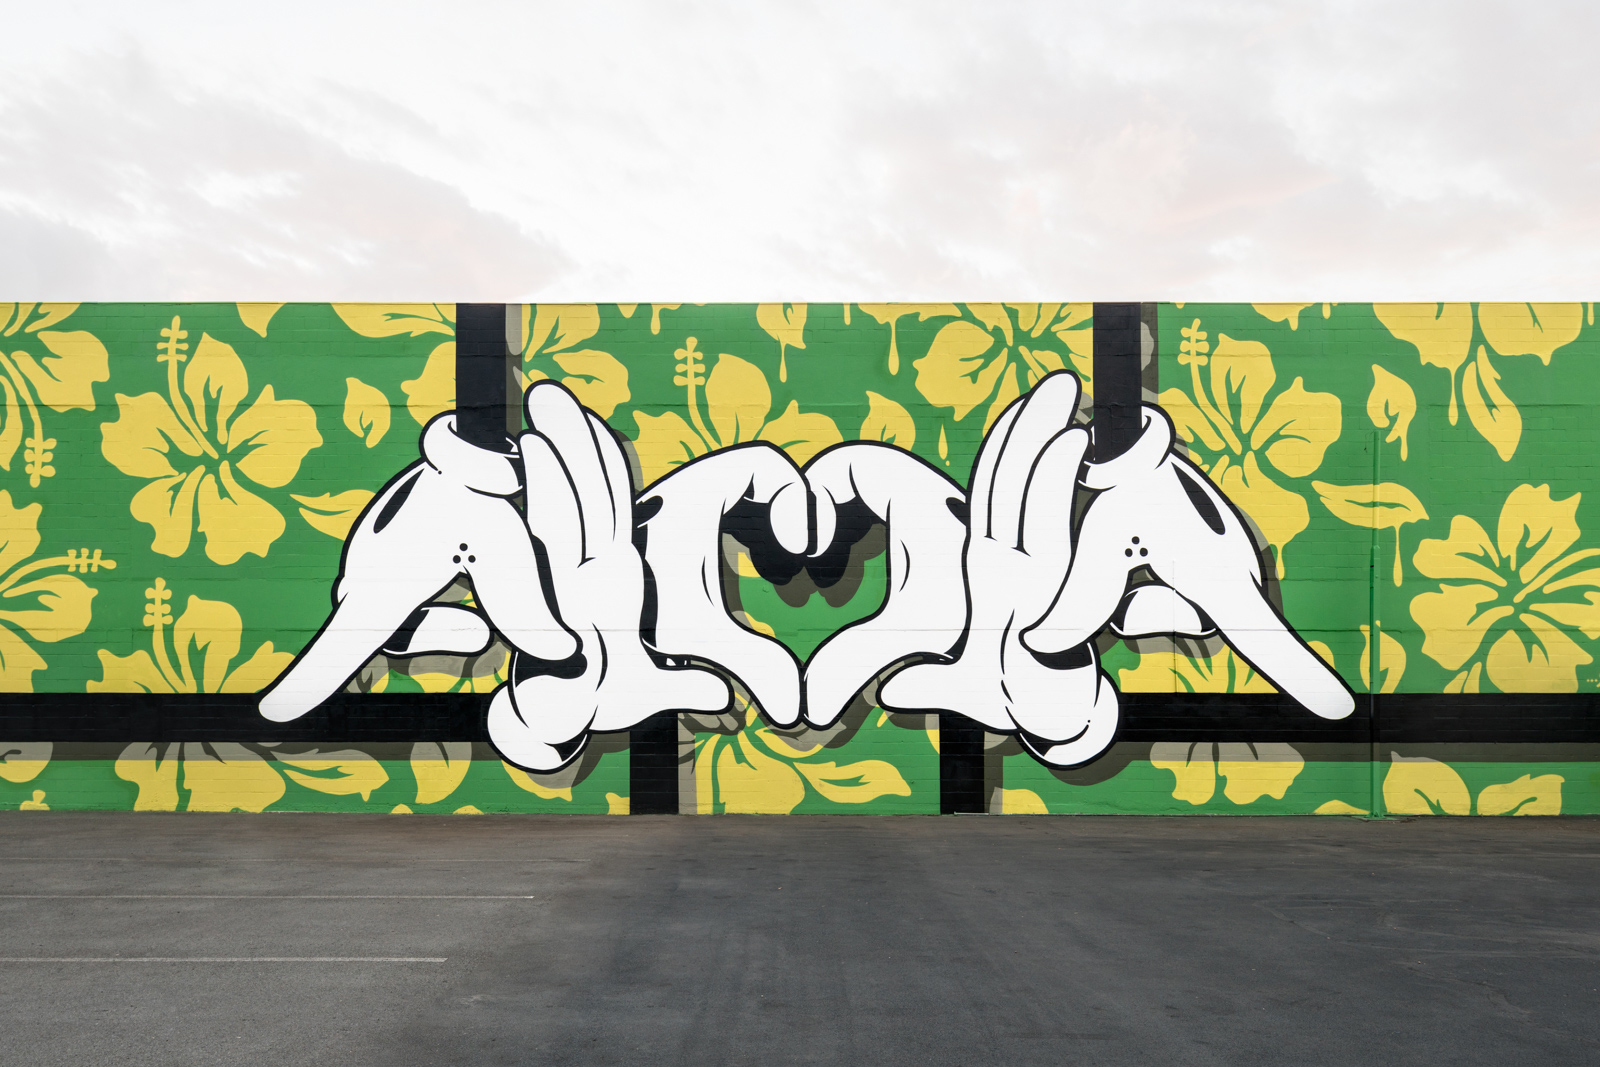 Pow Wow Street Art Hawaii OG Slick